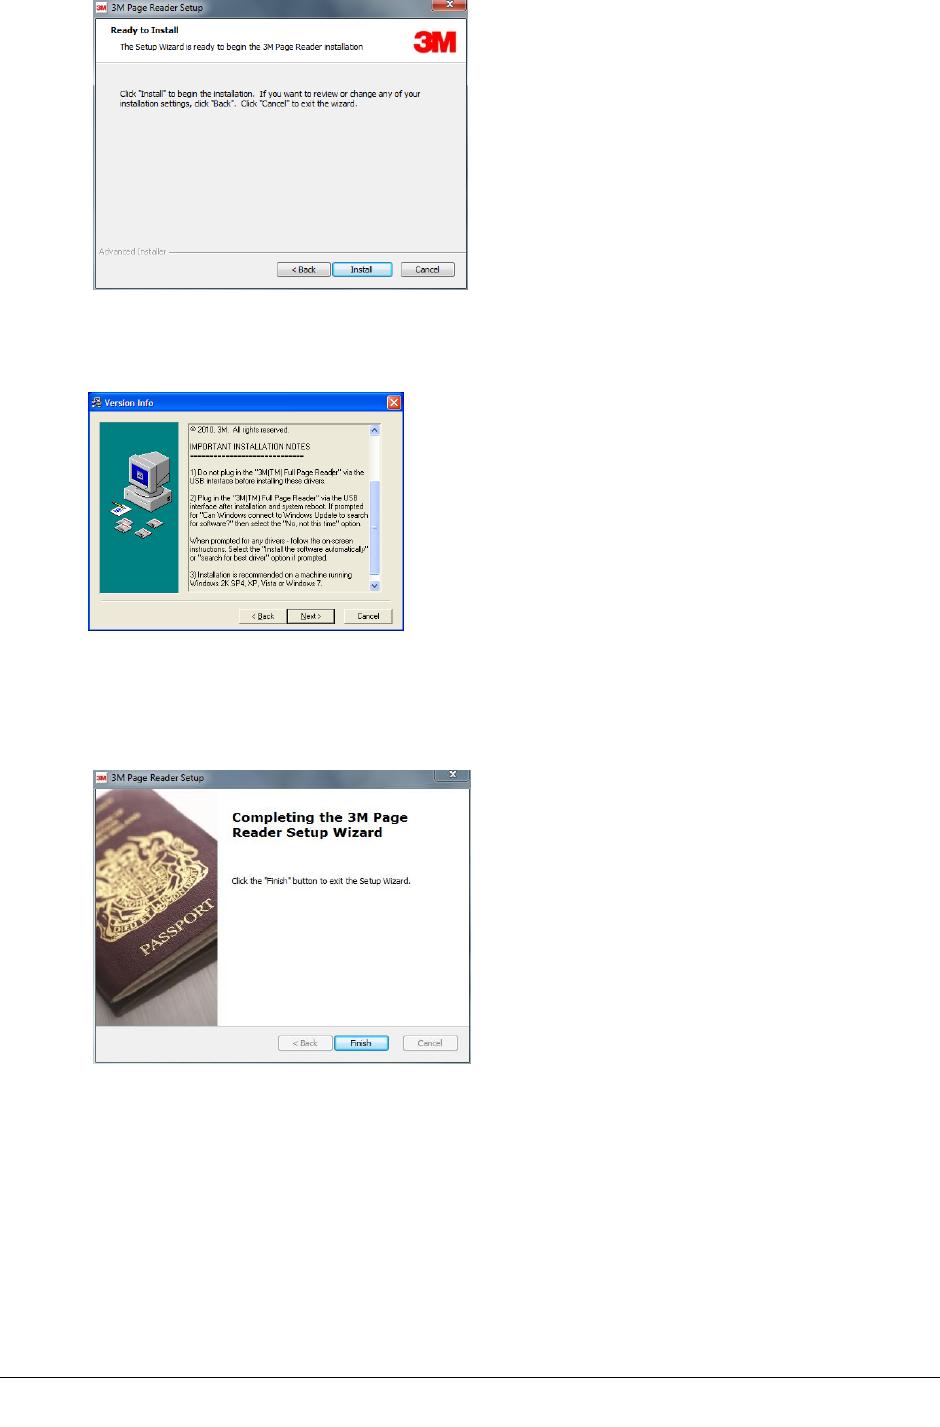 Gemalto PV351515 Kiosk ePassport Reader User Manual 1